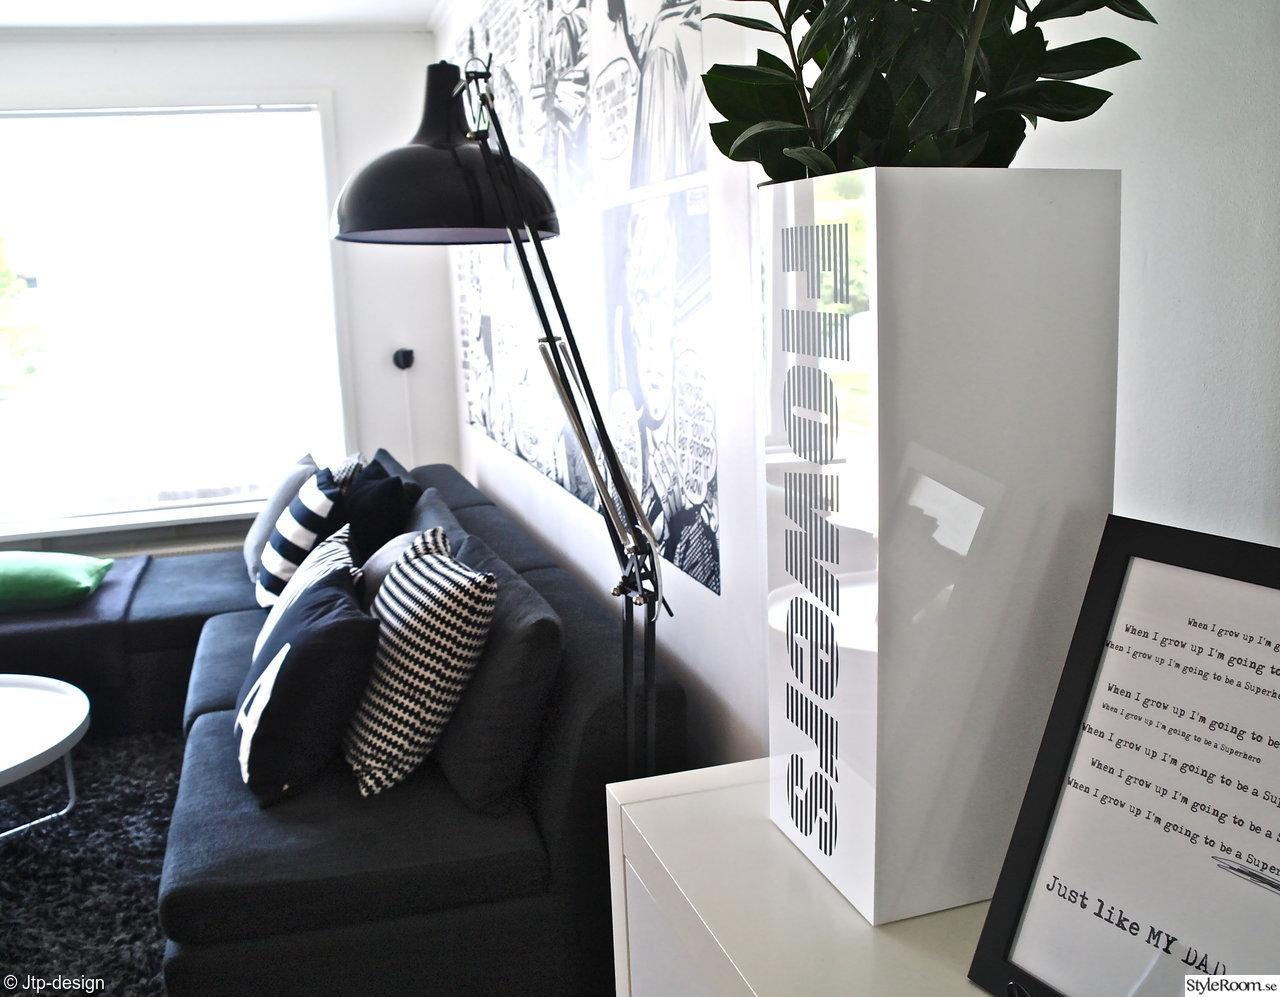 stor kruka,jtp-design,kuddar,svart,tophat,lamap,golvlampa,ikea stockholm,soffa,vev telefon,väska,lampa,tapet,vitt